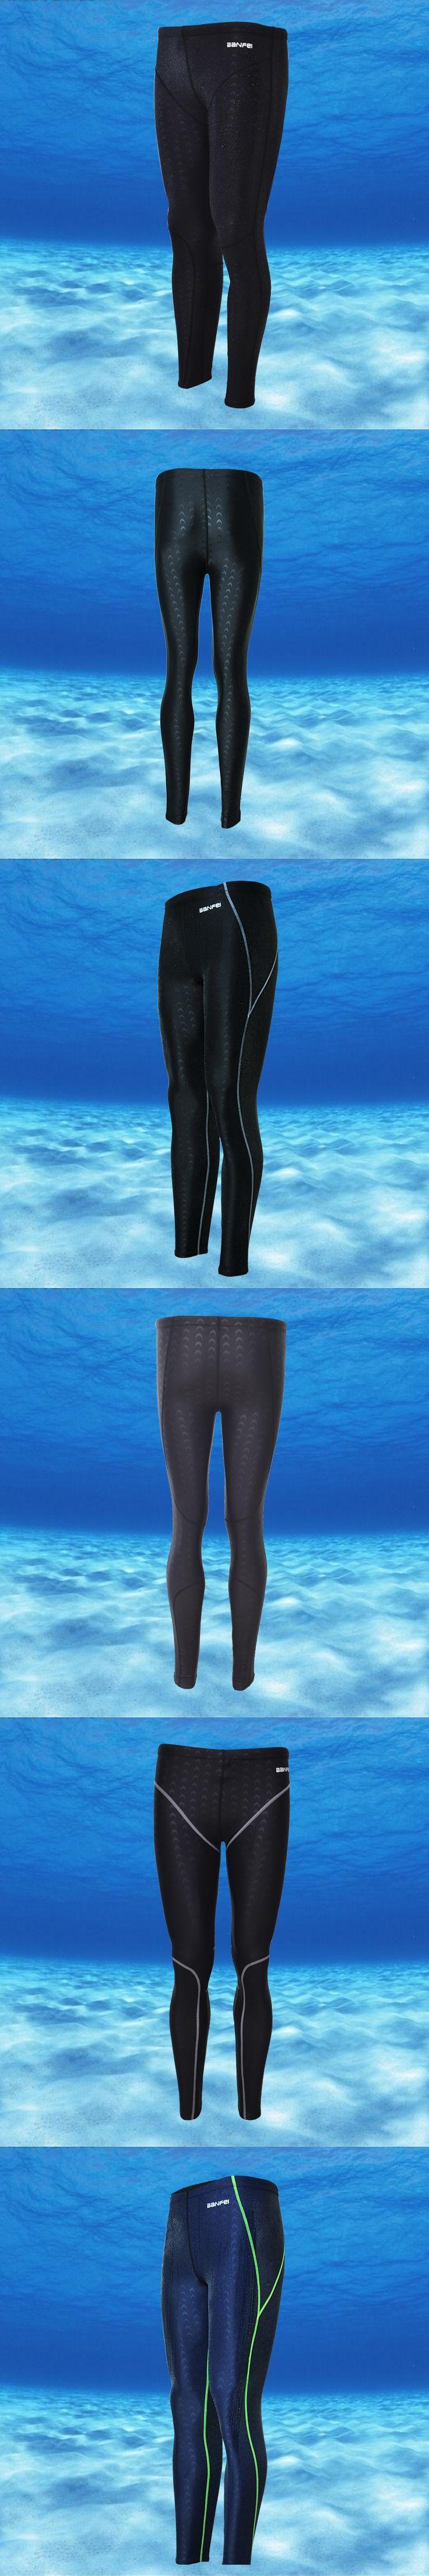 Free Shipping Swimwear Long Men's Swimsuit sharkskin water repellent men's swimming trunks Sport classic men swimwear